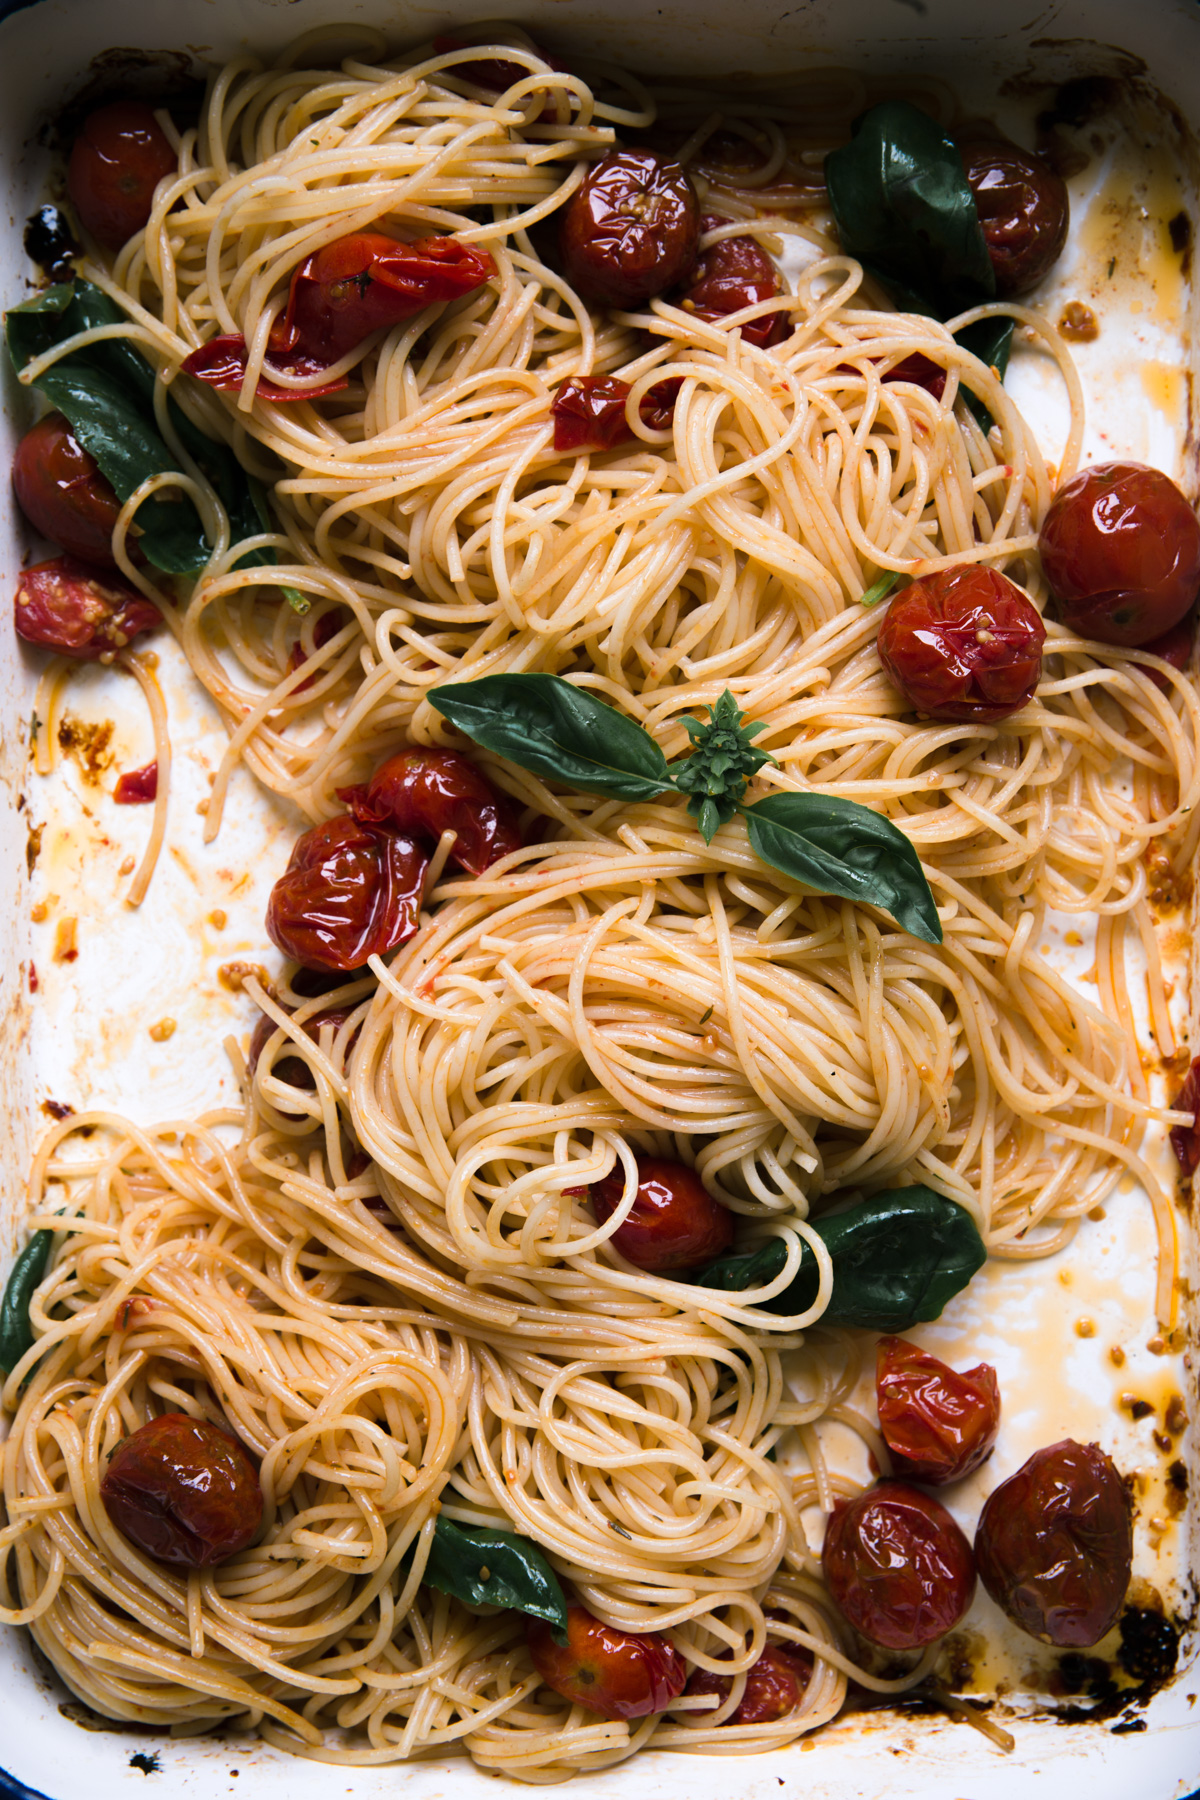 spaghettis aux tomates roties - Ophelie's Kitchen Book - Ophelie Lauret